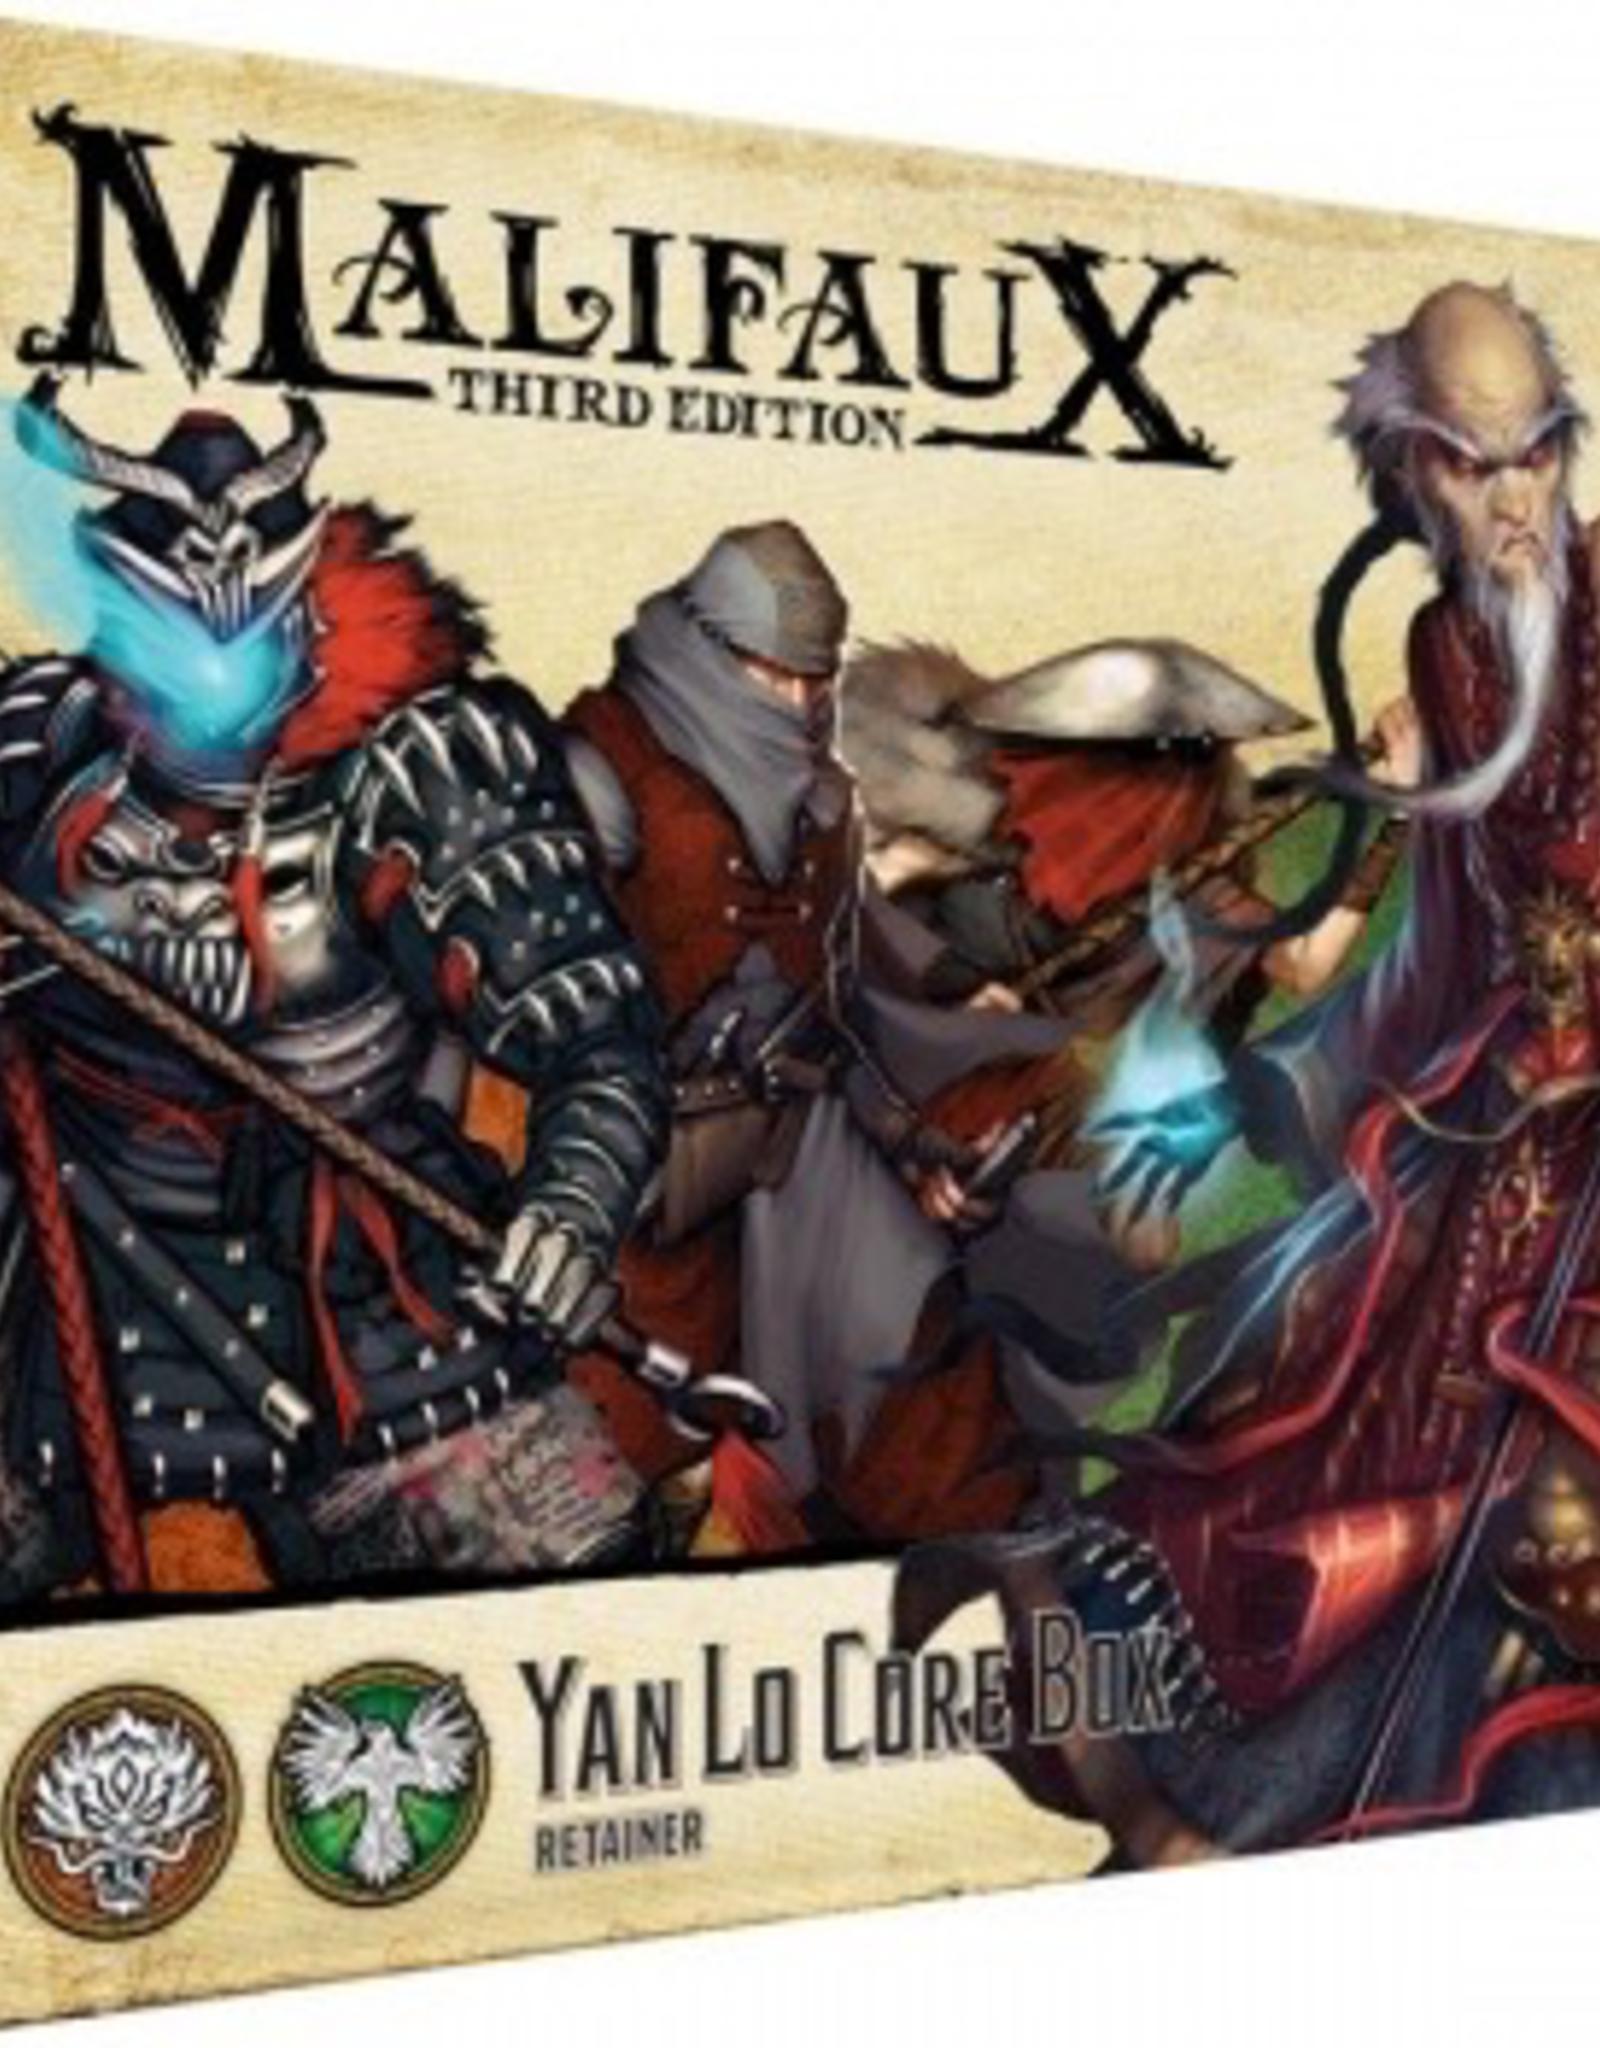 WYR - Malifaux Miniaturen Malifaux 3rd Edition - Yan Lo Core Box - EN